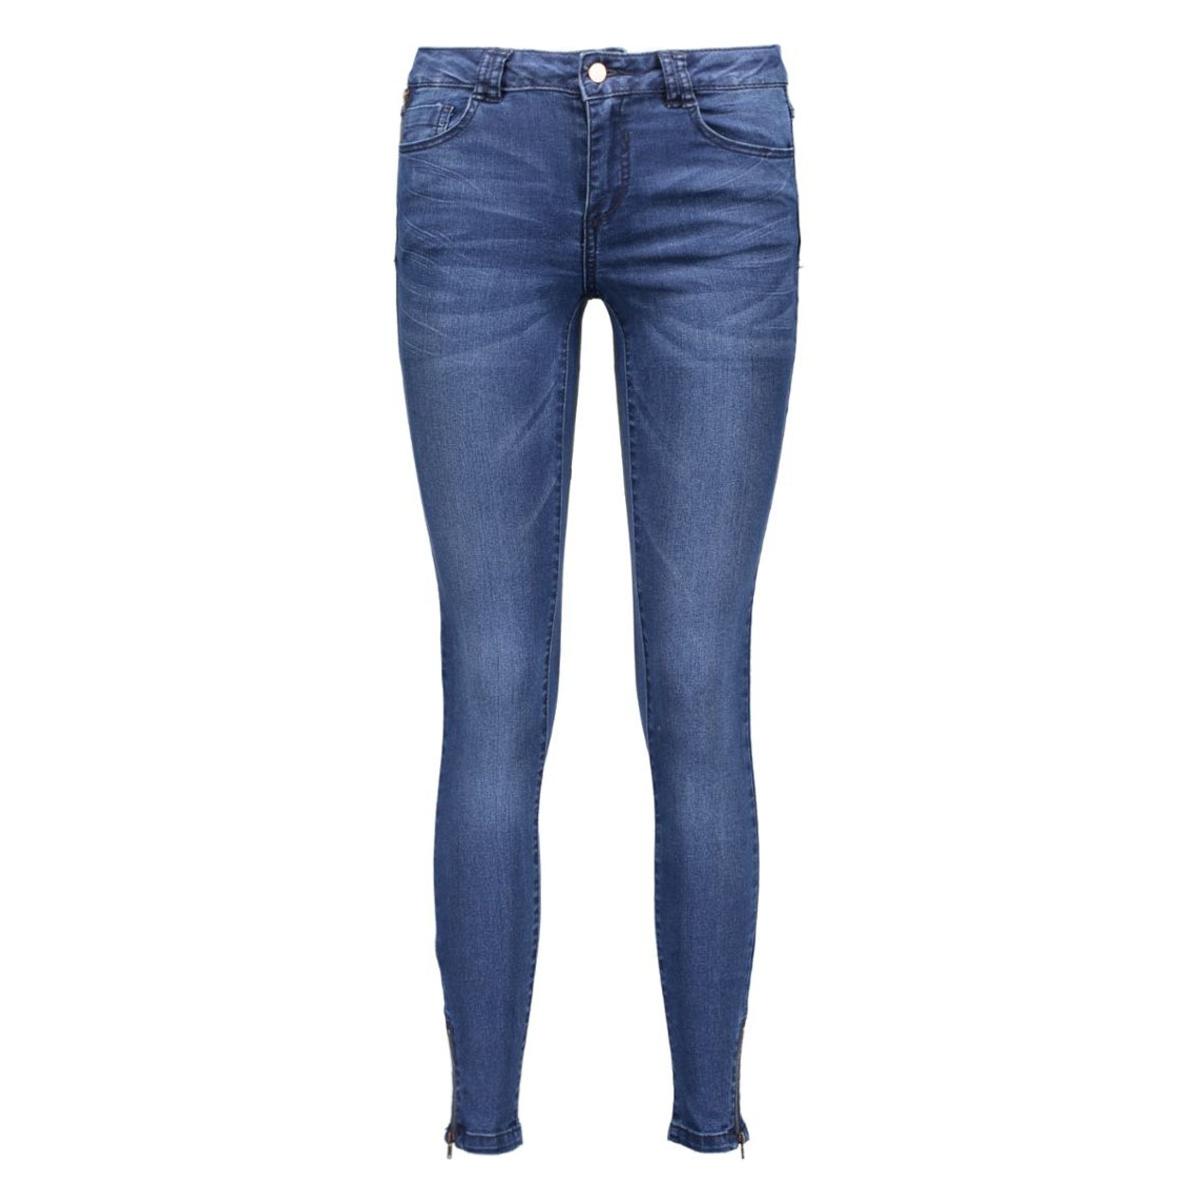 vicommit rw 5p 7/8 hk0107 zip 14033103 vila jeans medium blue